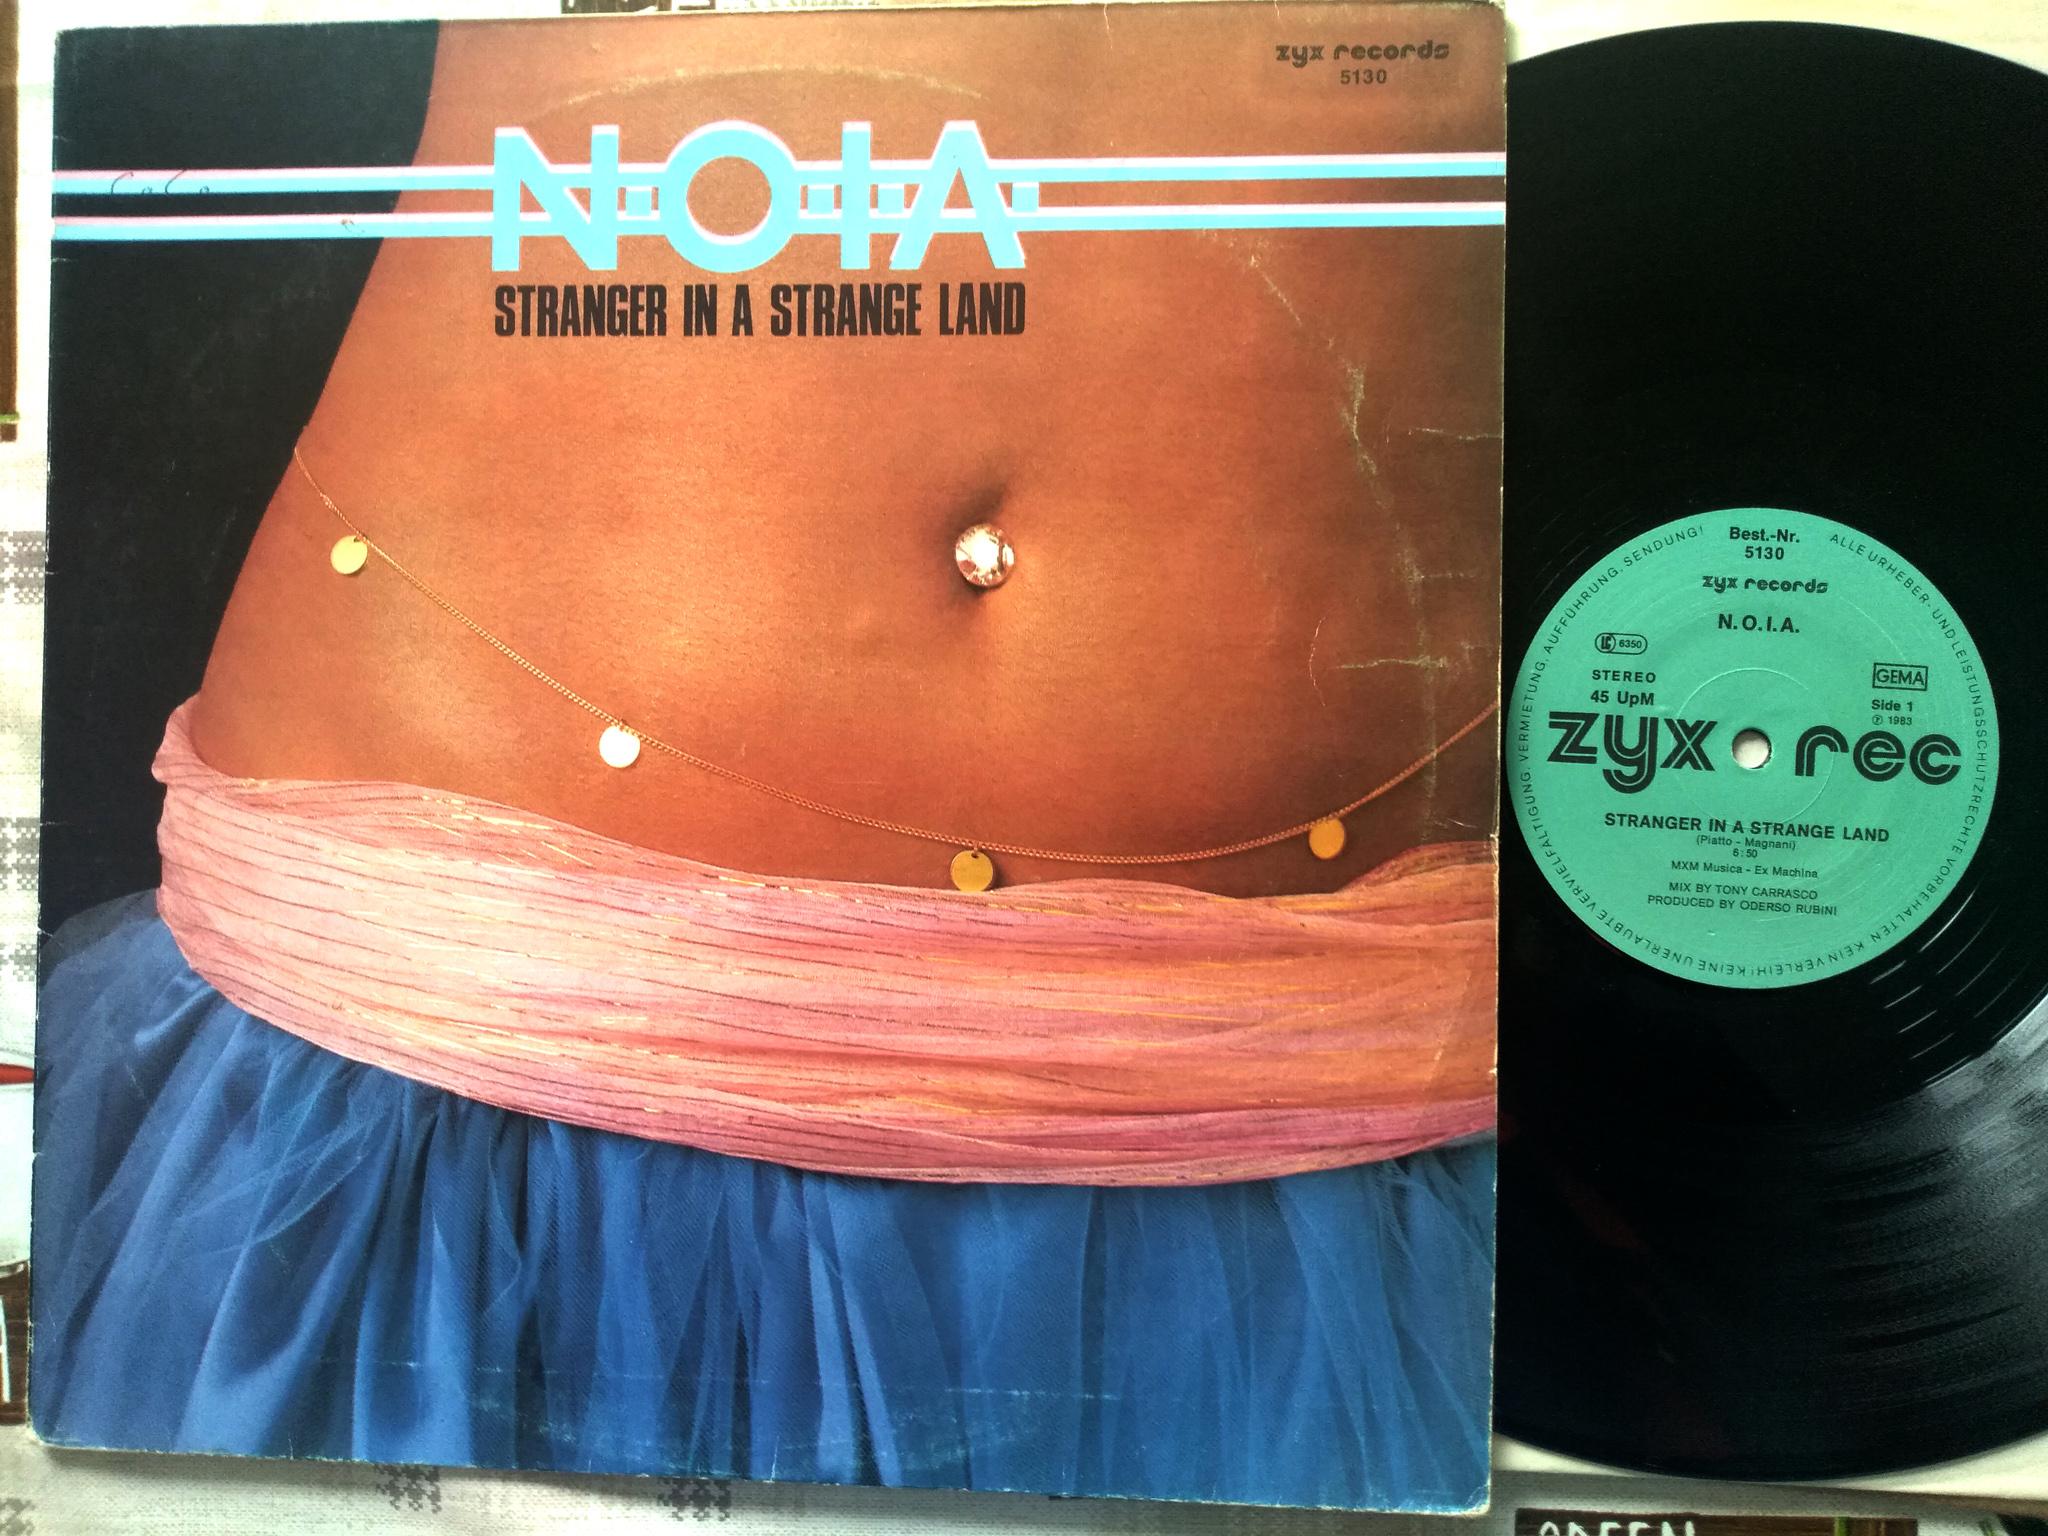 N.O.I.A - Stranger In A Strange Land